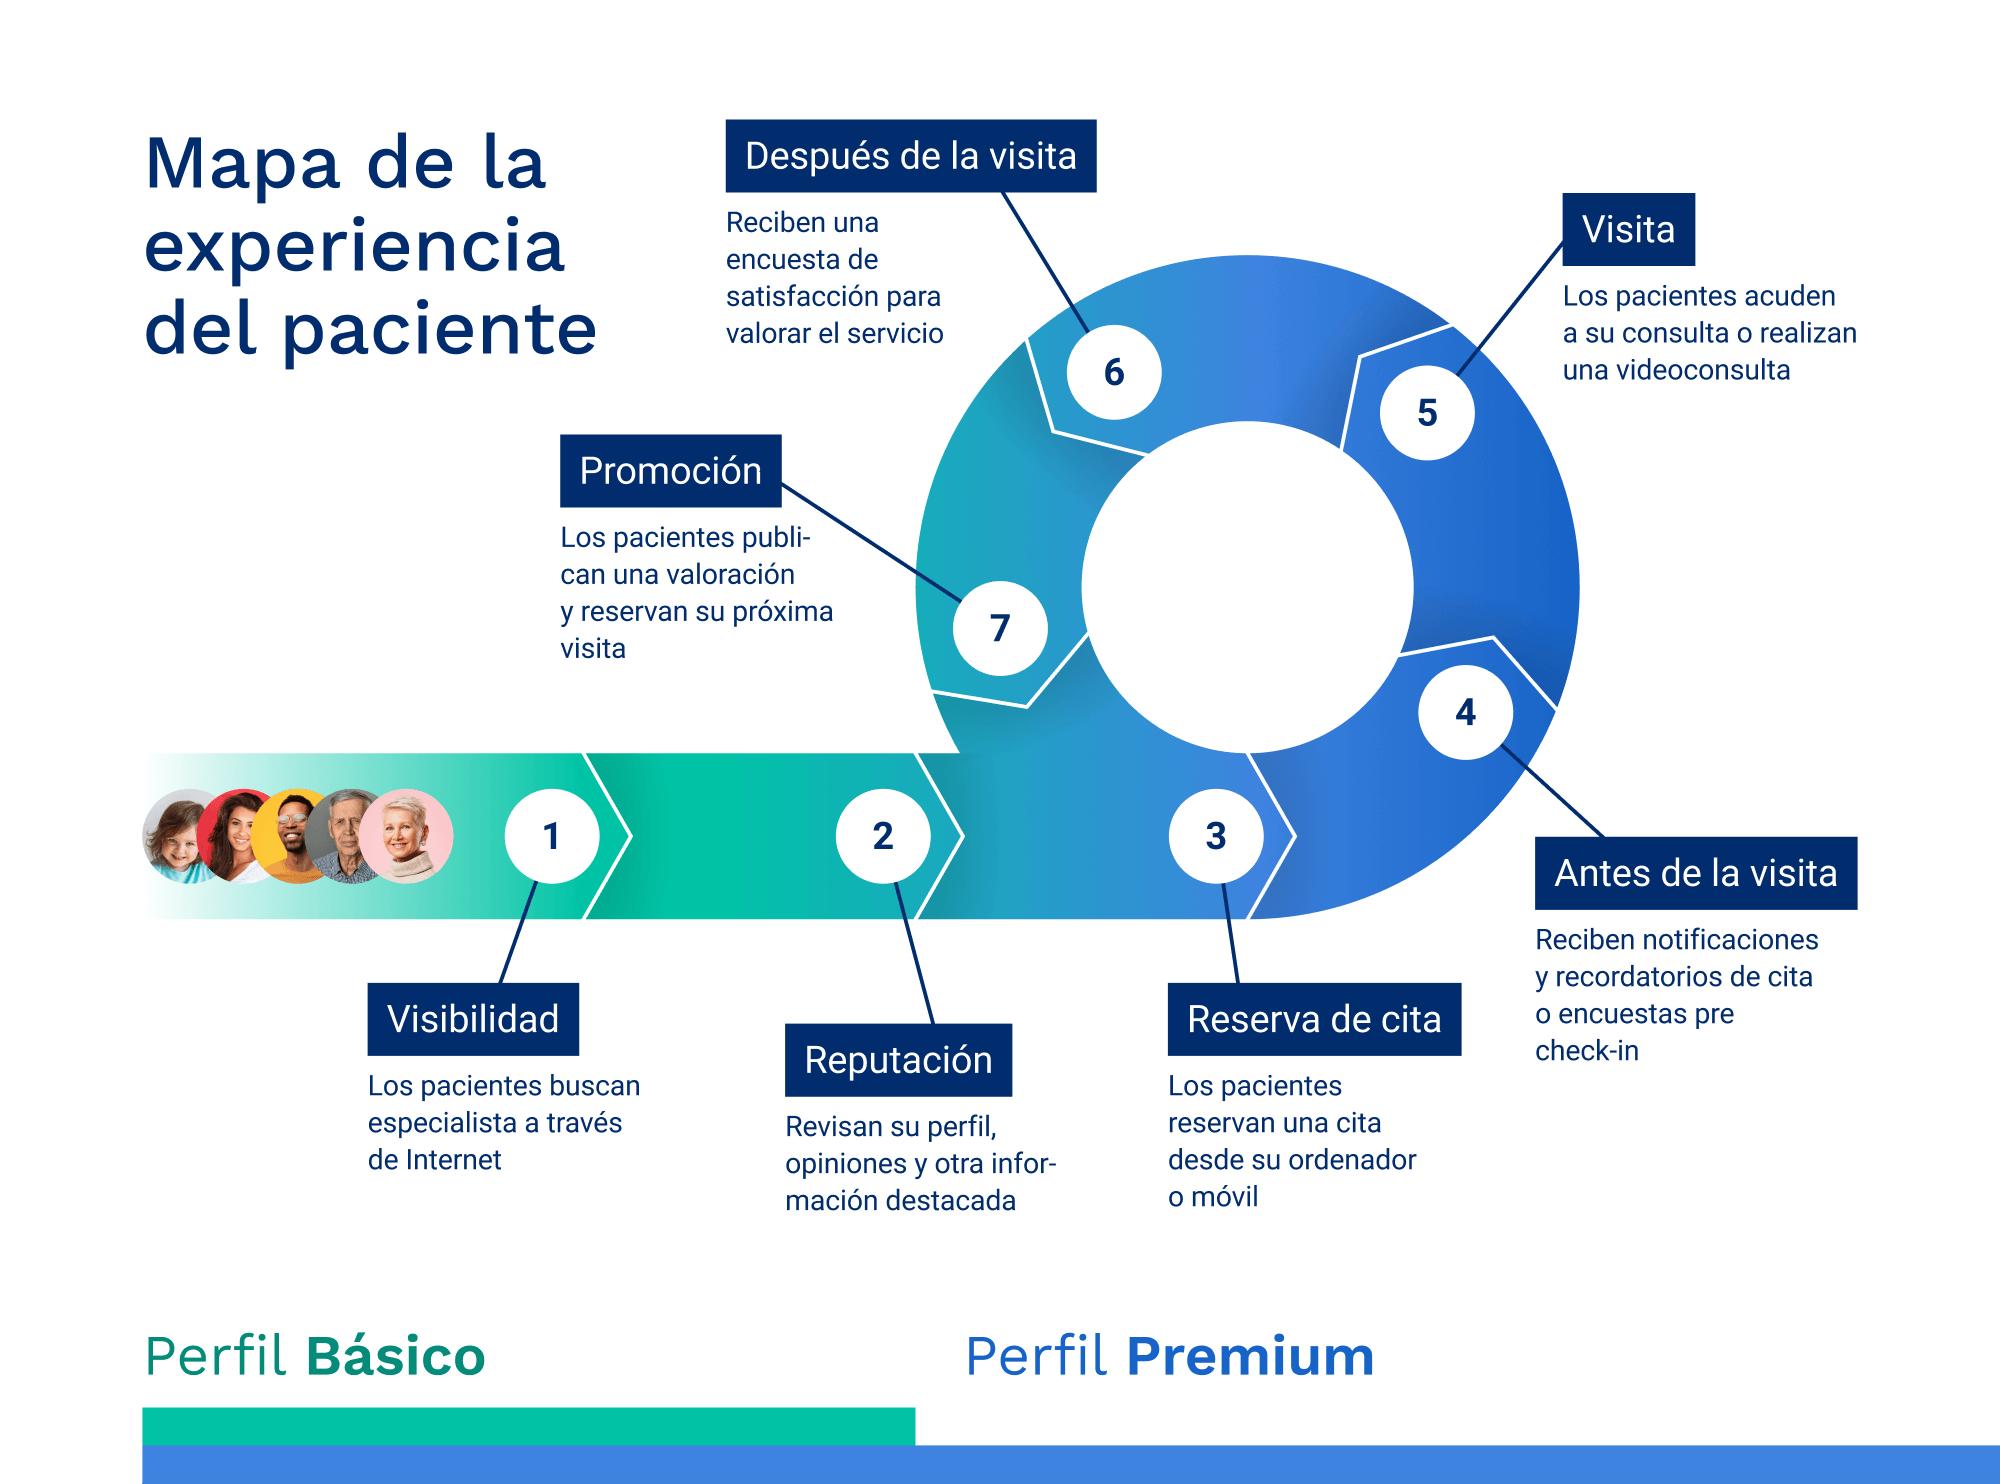 es-infographic-px-journey